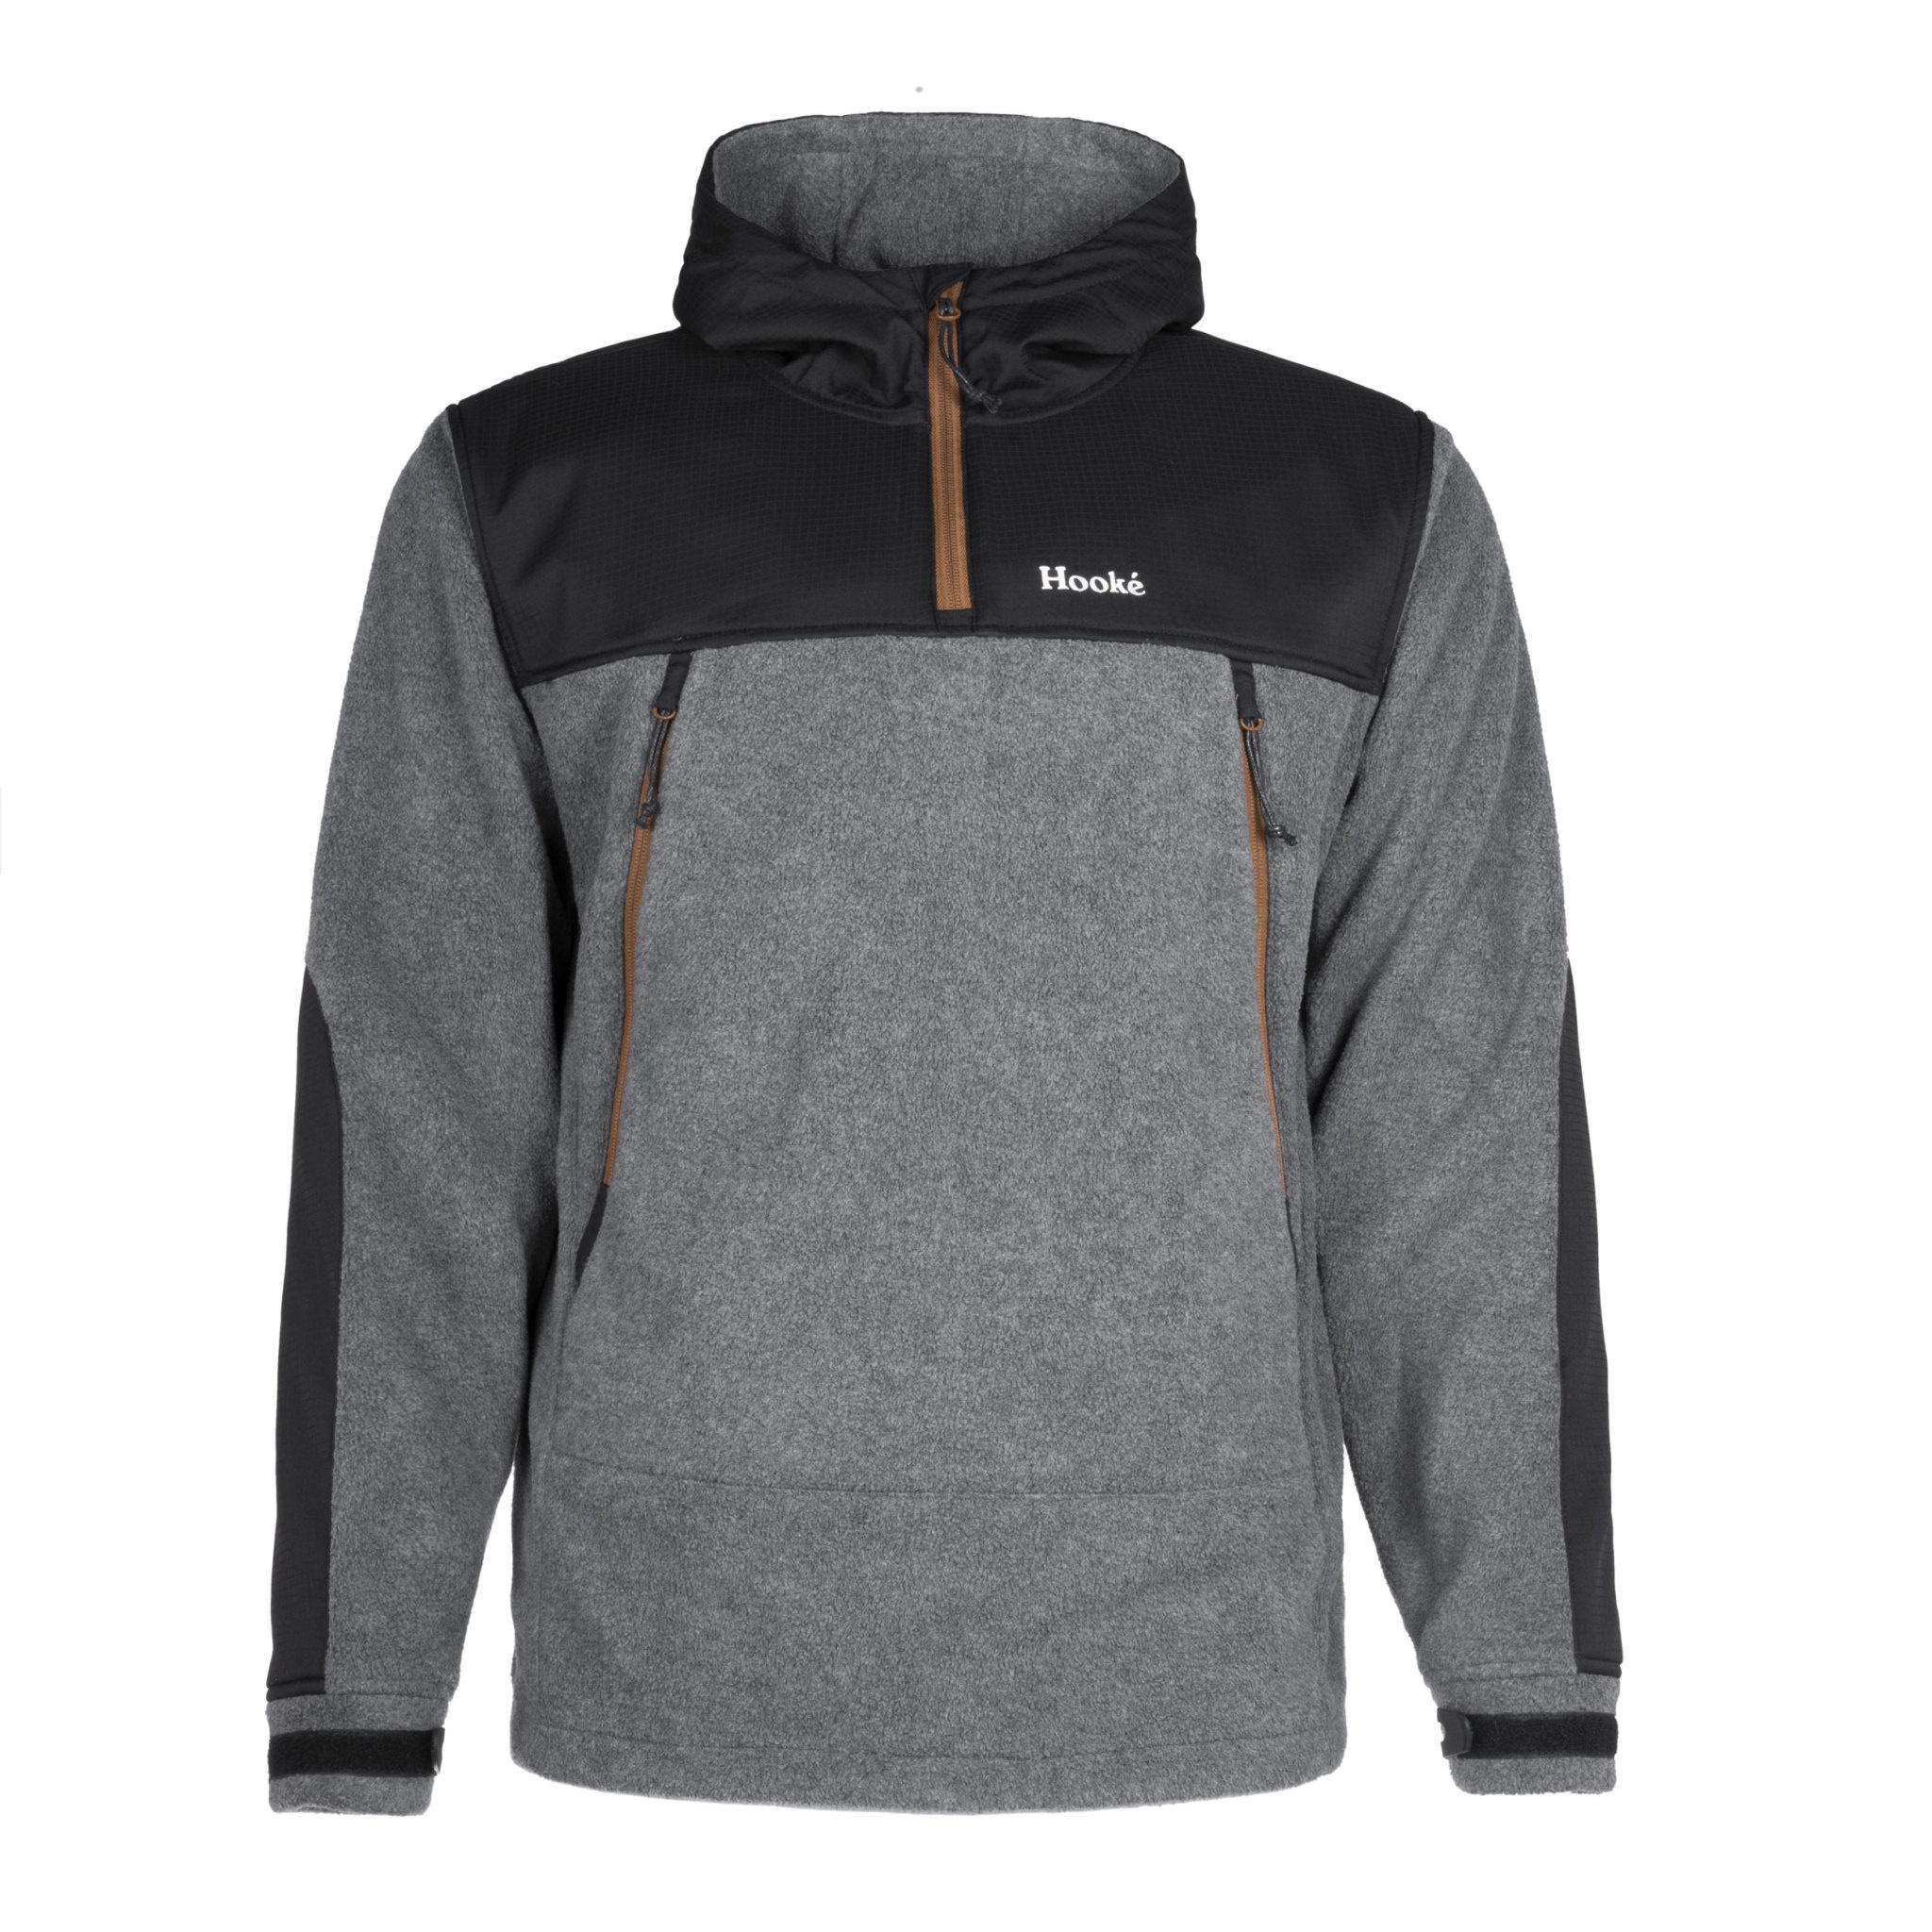 Tech Fleece Hoodie Charcoal & Black